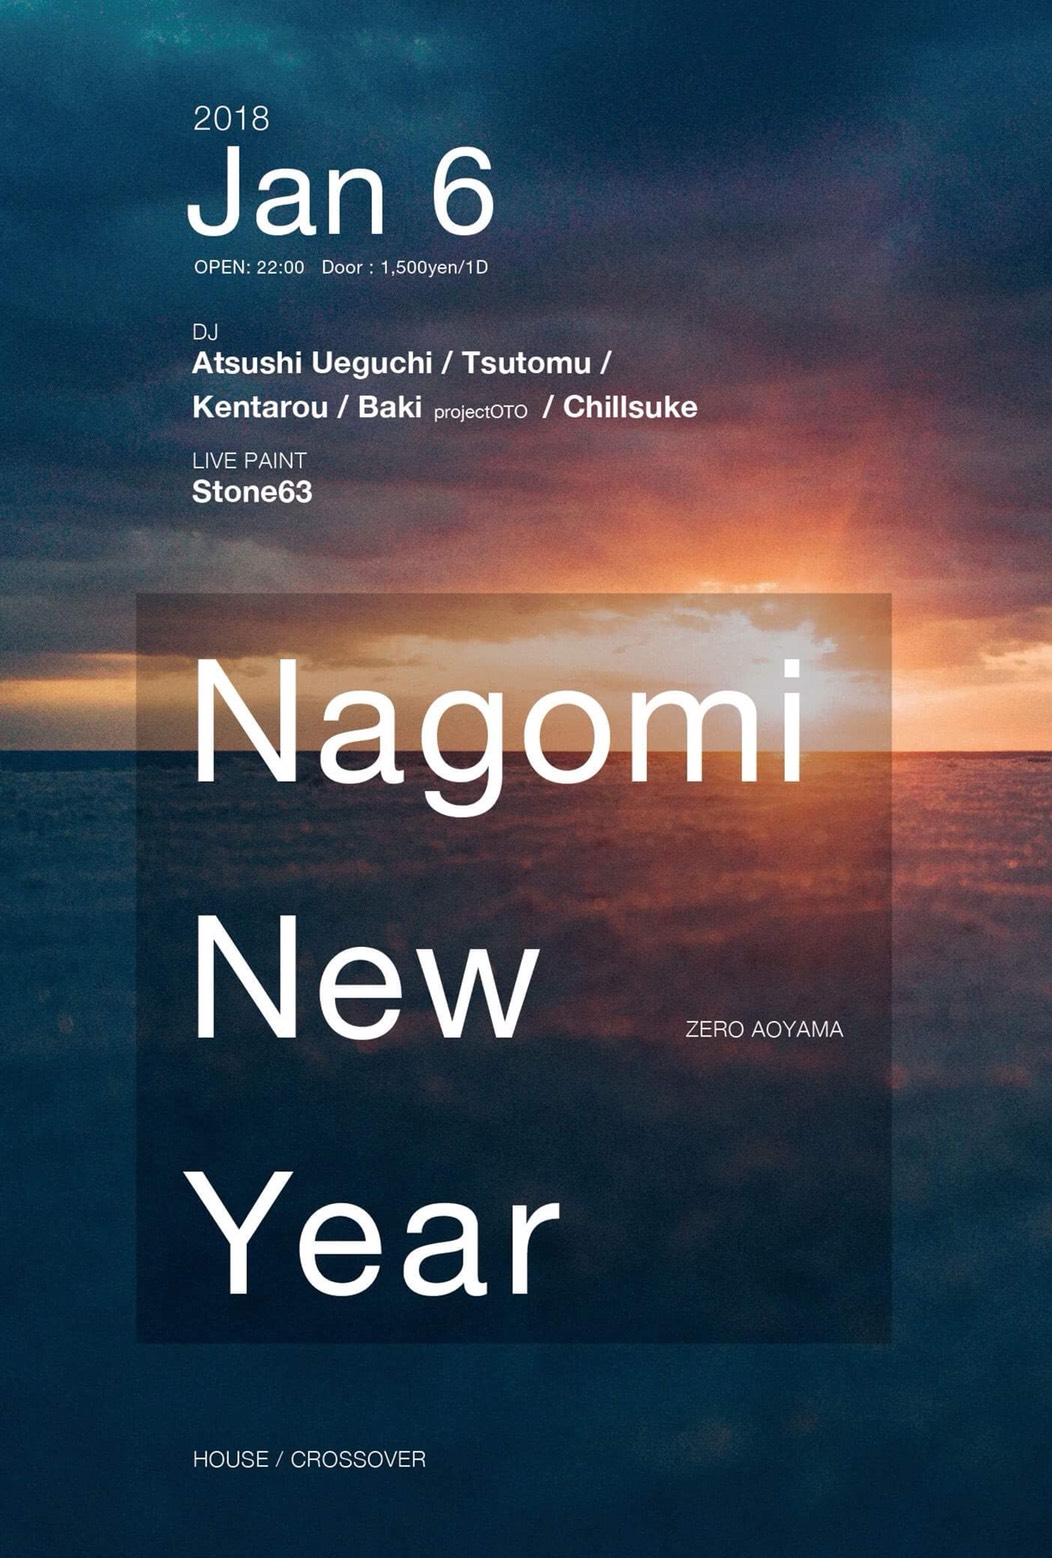 nagomi -New Year Special- at Aoyama Zero